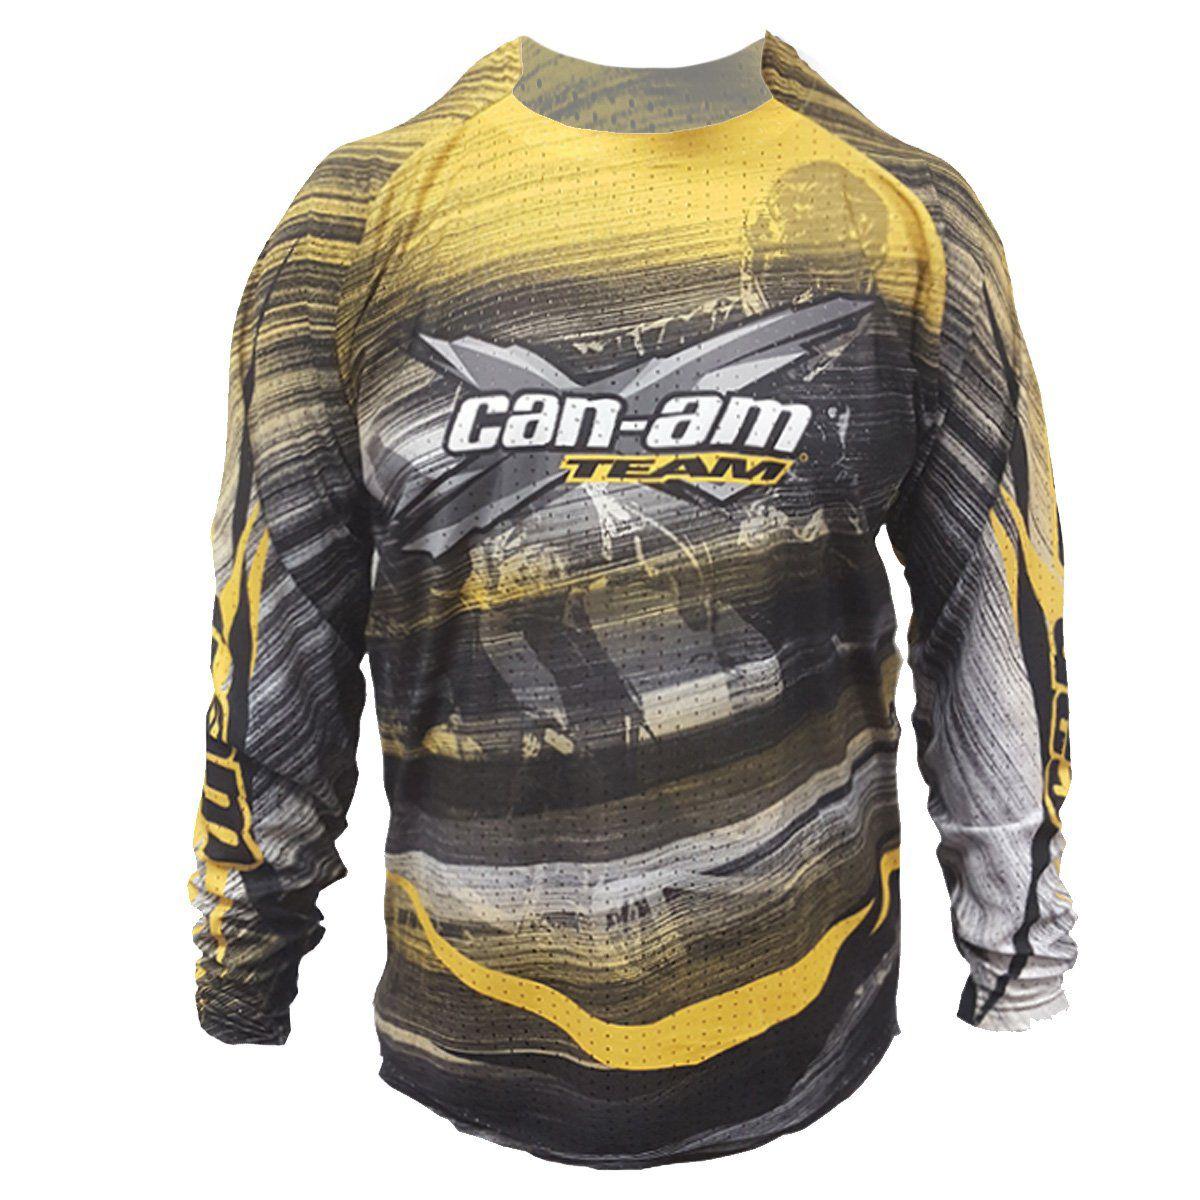 Camisa USA X-Race Can-Am Masculina Amarela